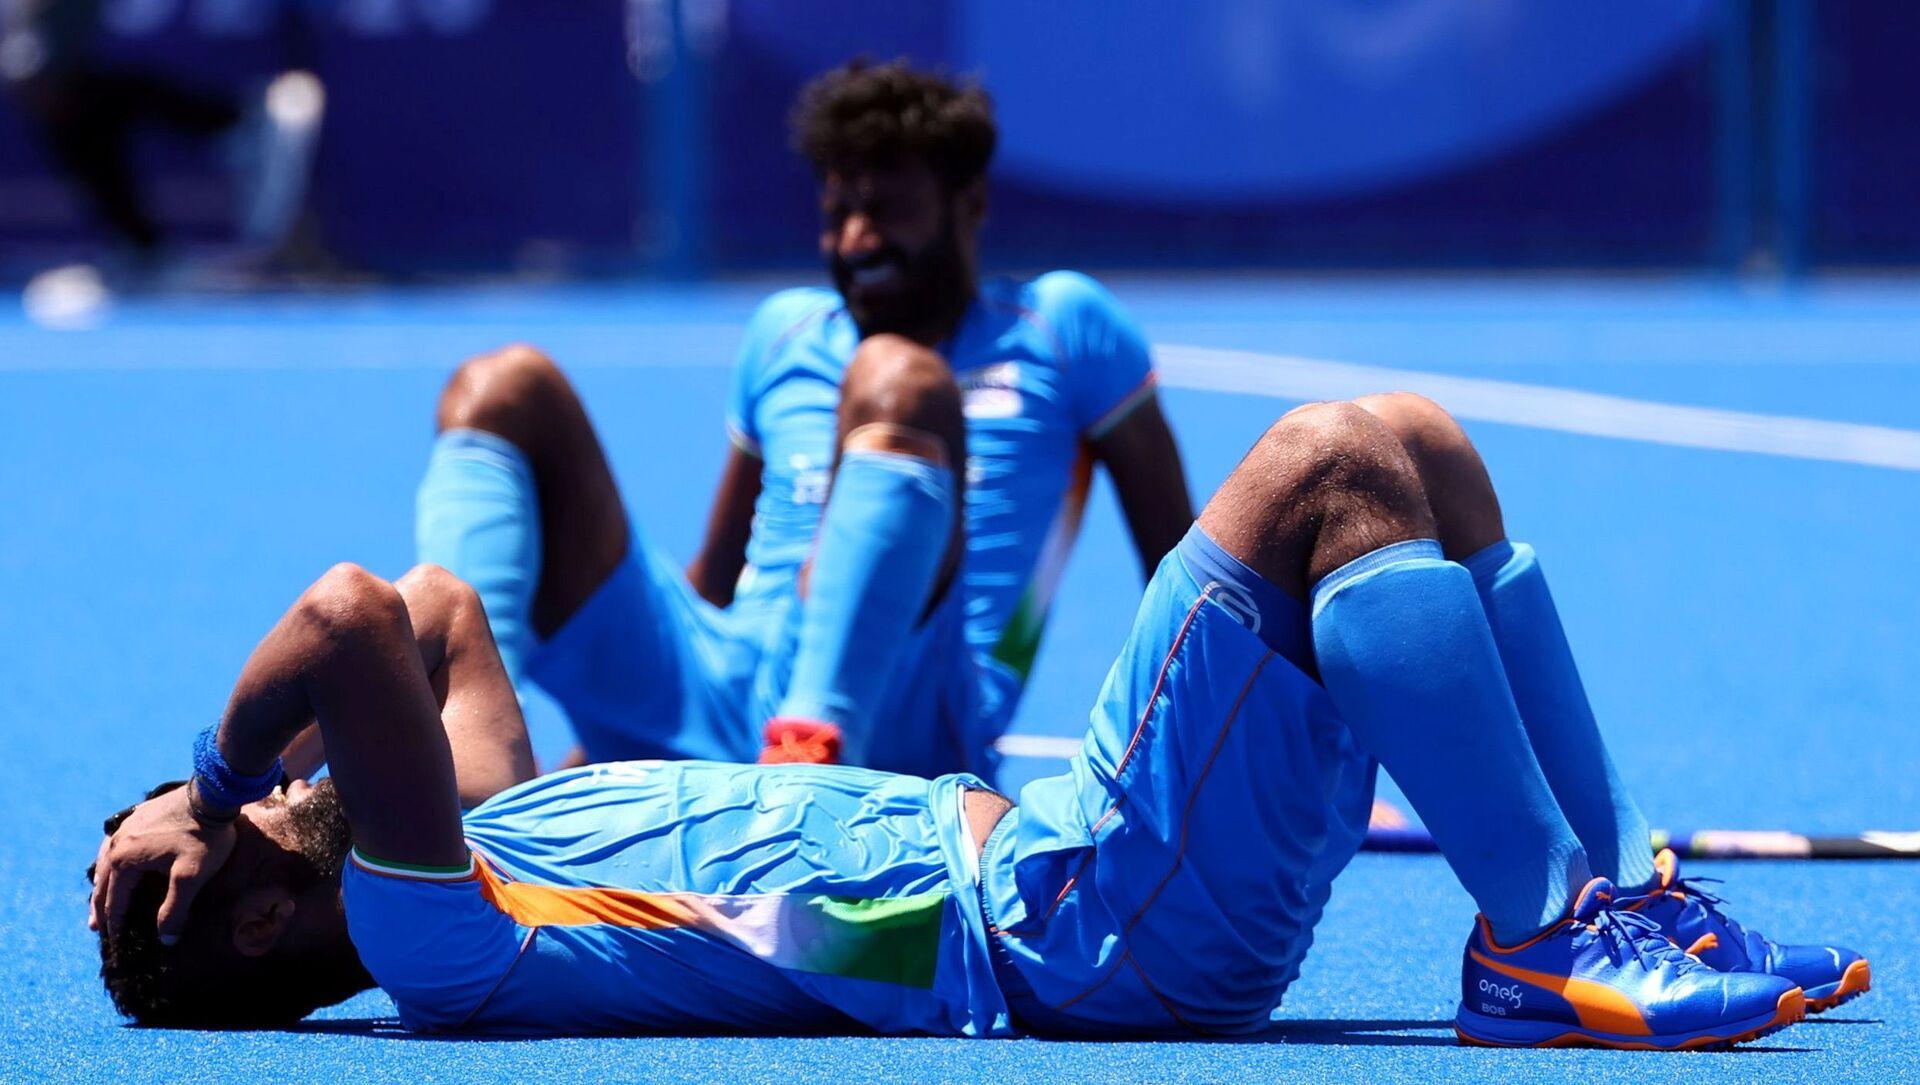 Tokyo 2020 Olympics - Hockey - Men - Semifinal - India v Belgium - Oi Hockey Stadium, Tokyo, Japan - August 3, 2021. Rupinder Pal Singh of India reacts after losing their match. - Sputnik International, 1920, 03.08.2021